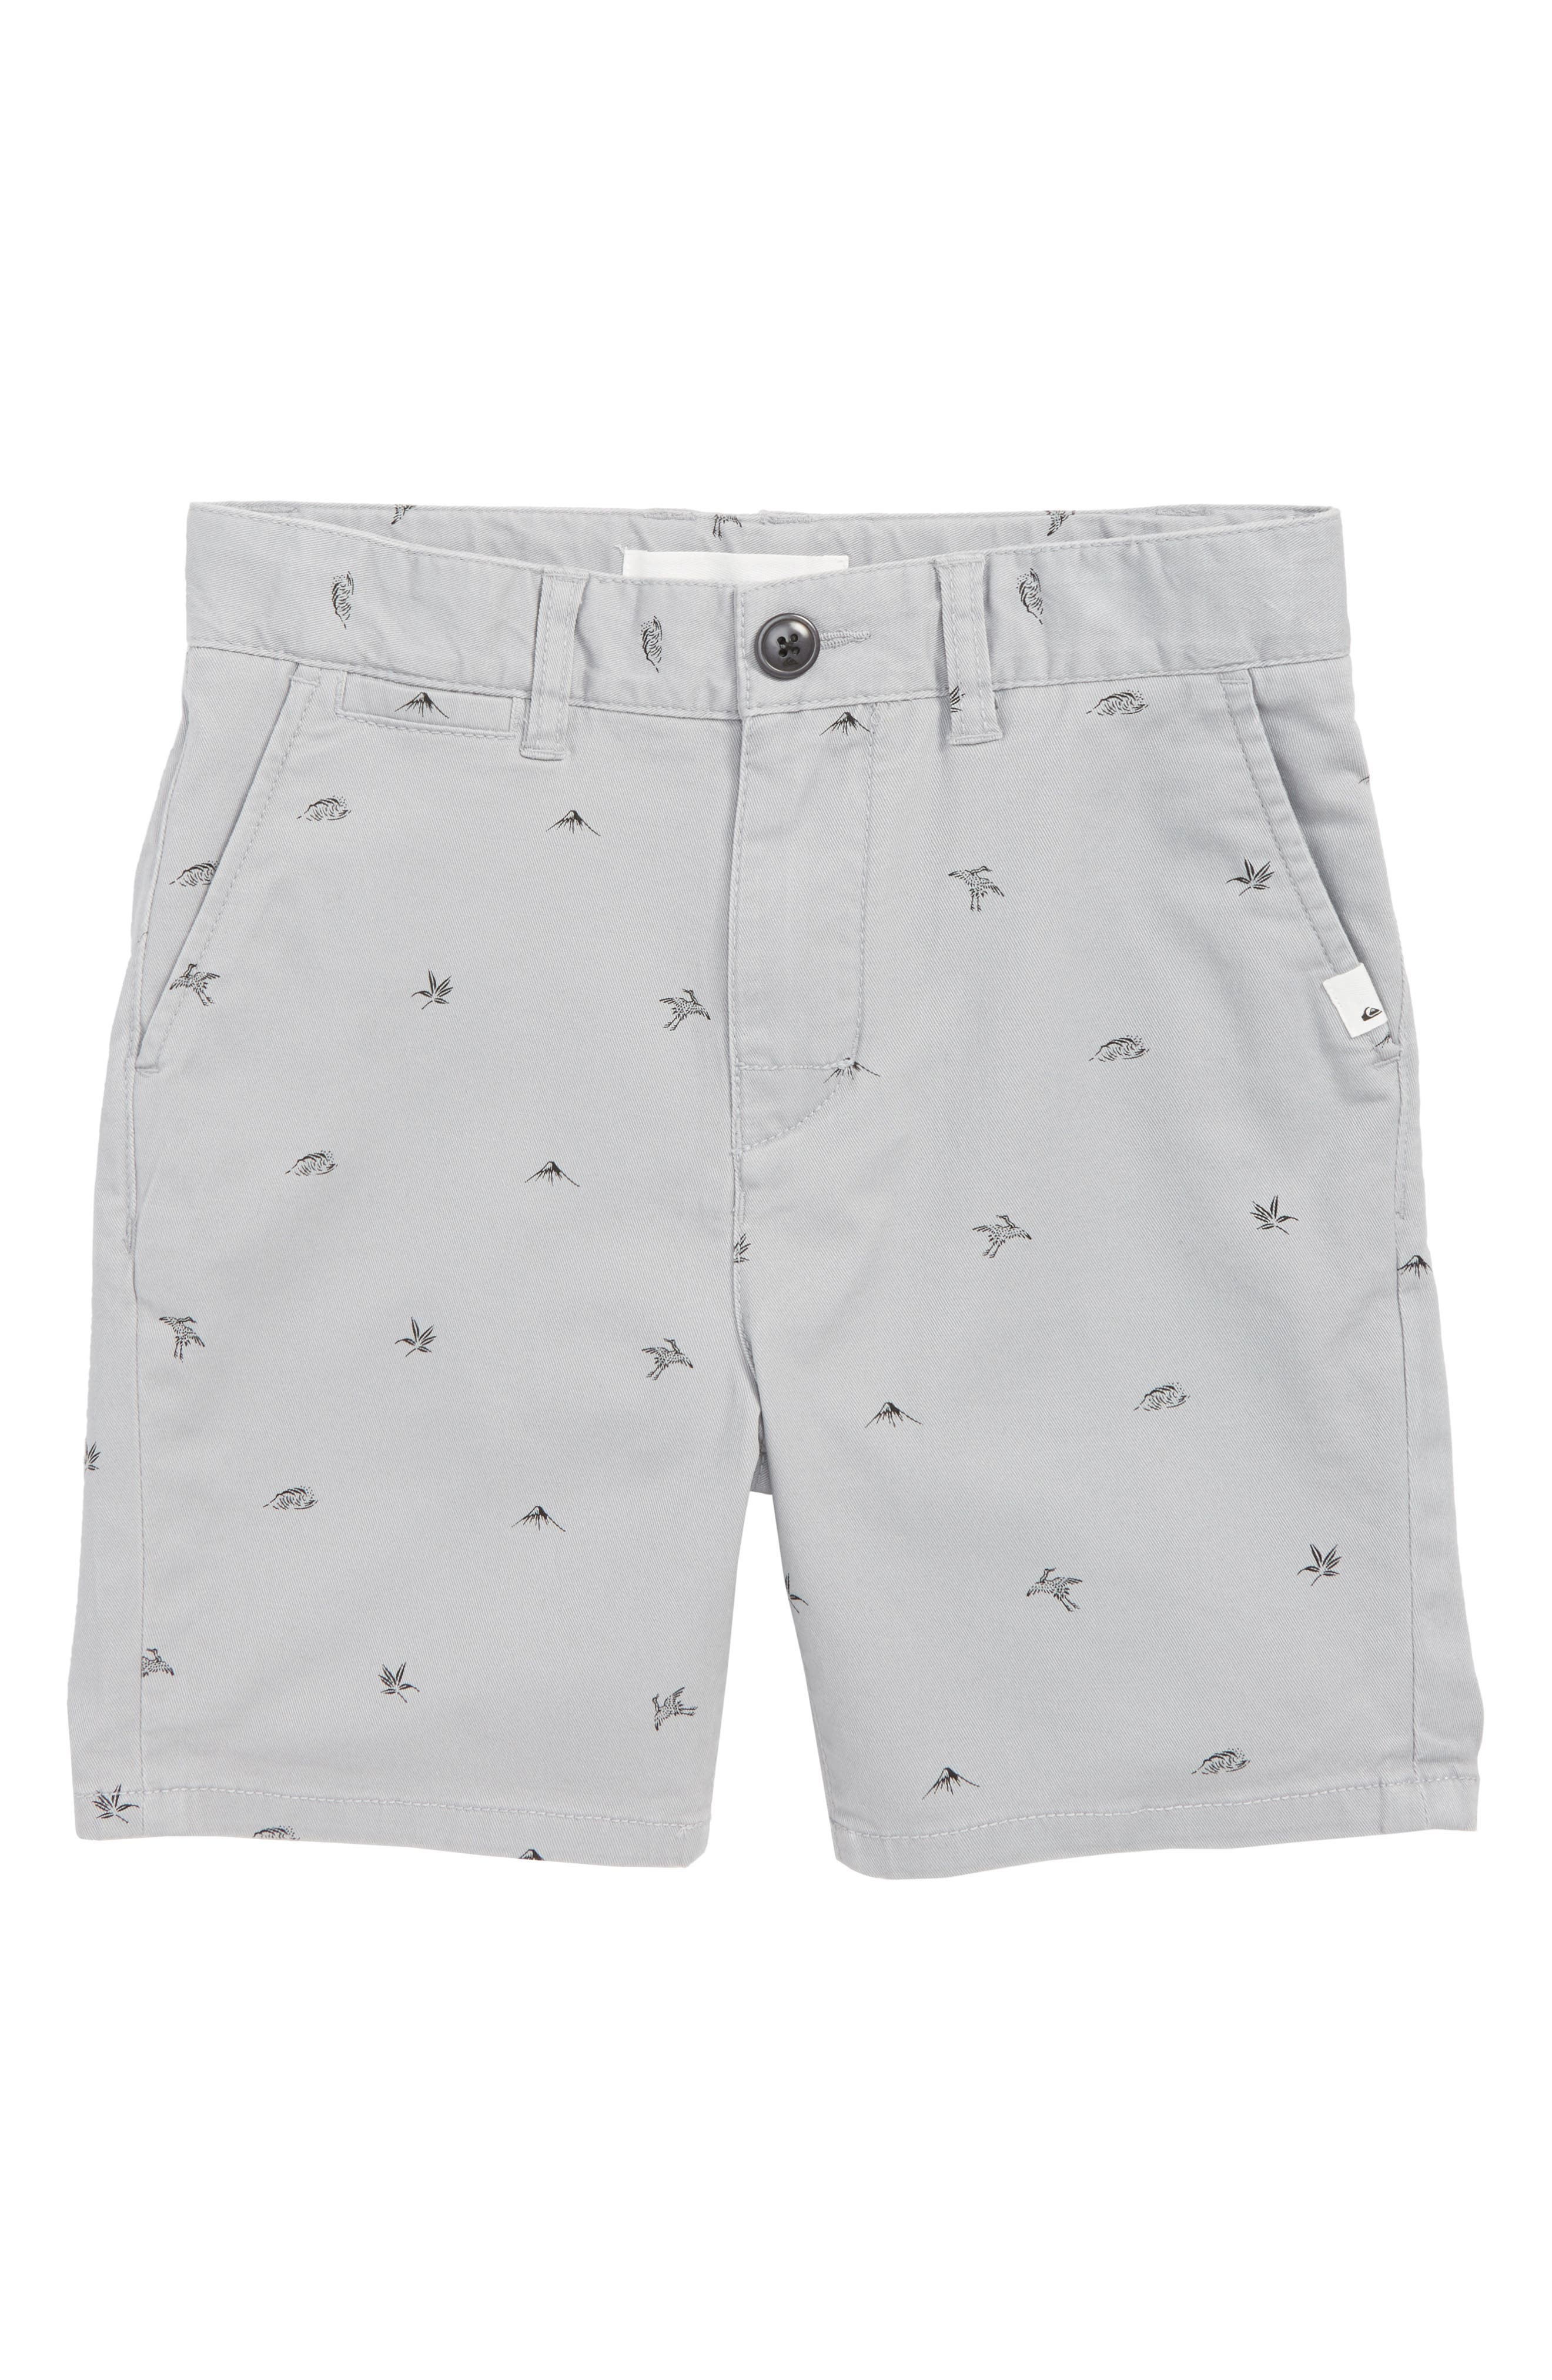 Krandy Fuji Chino Shorts,                         Main,                         color, SLEET